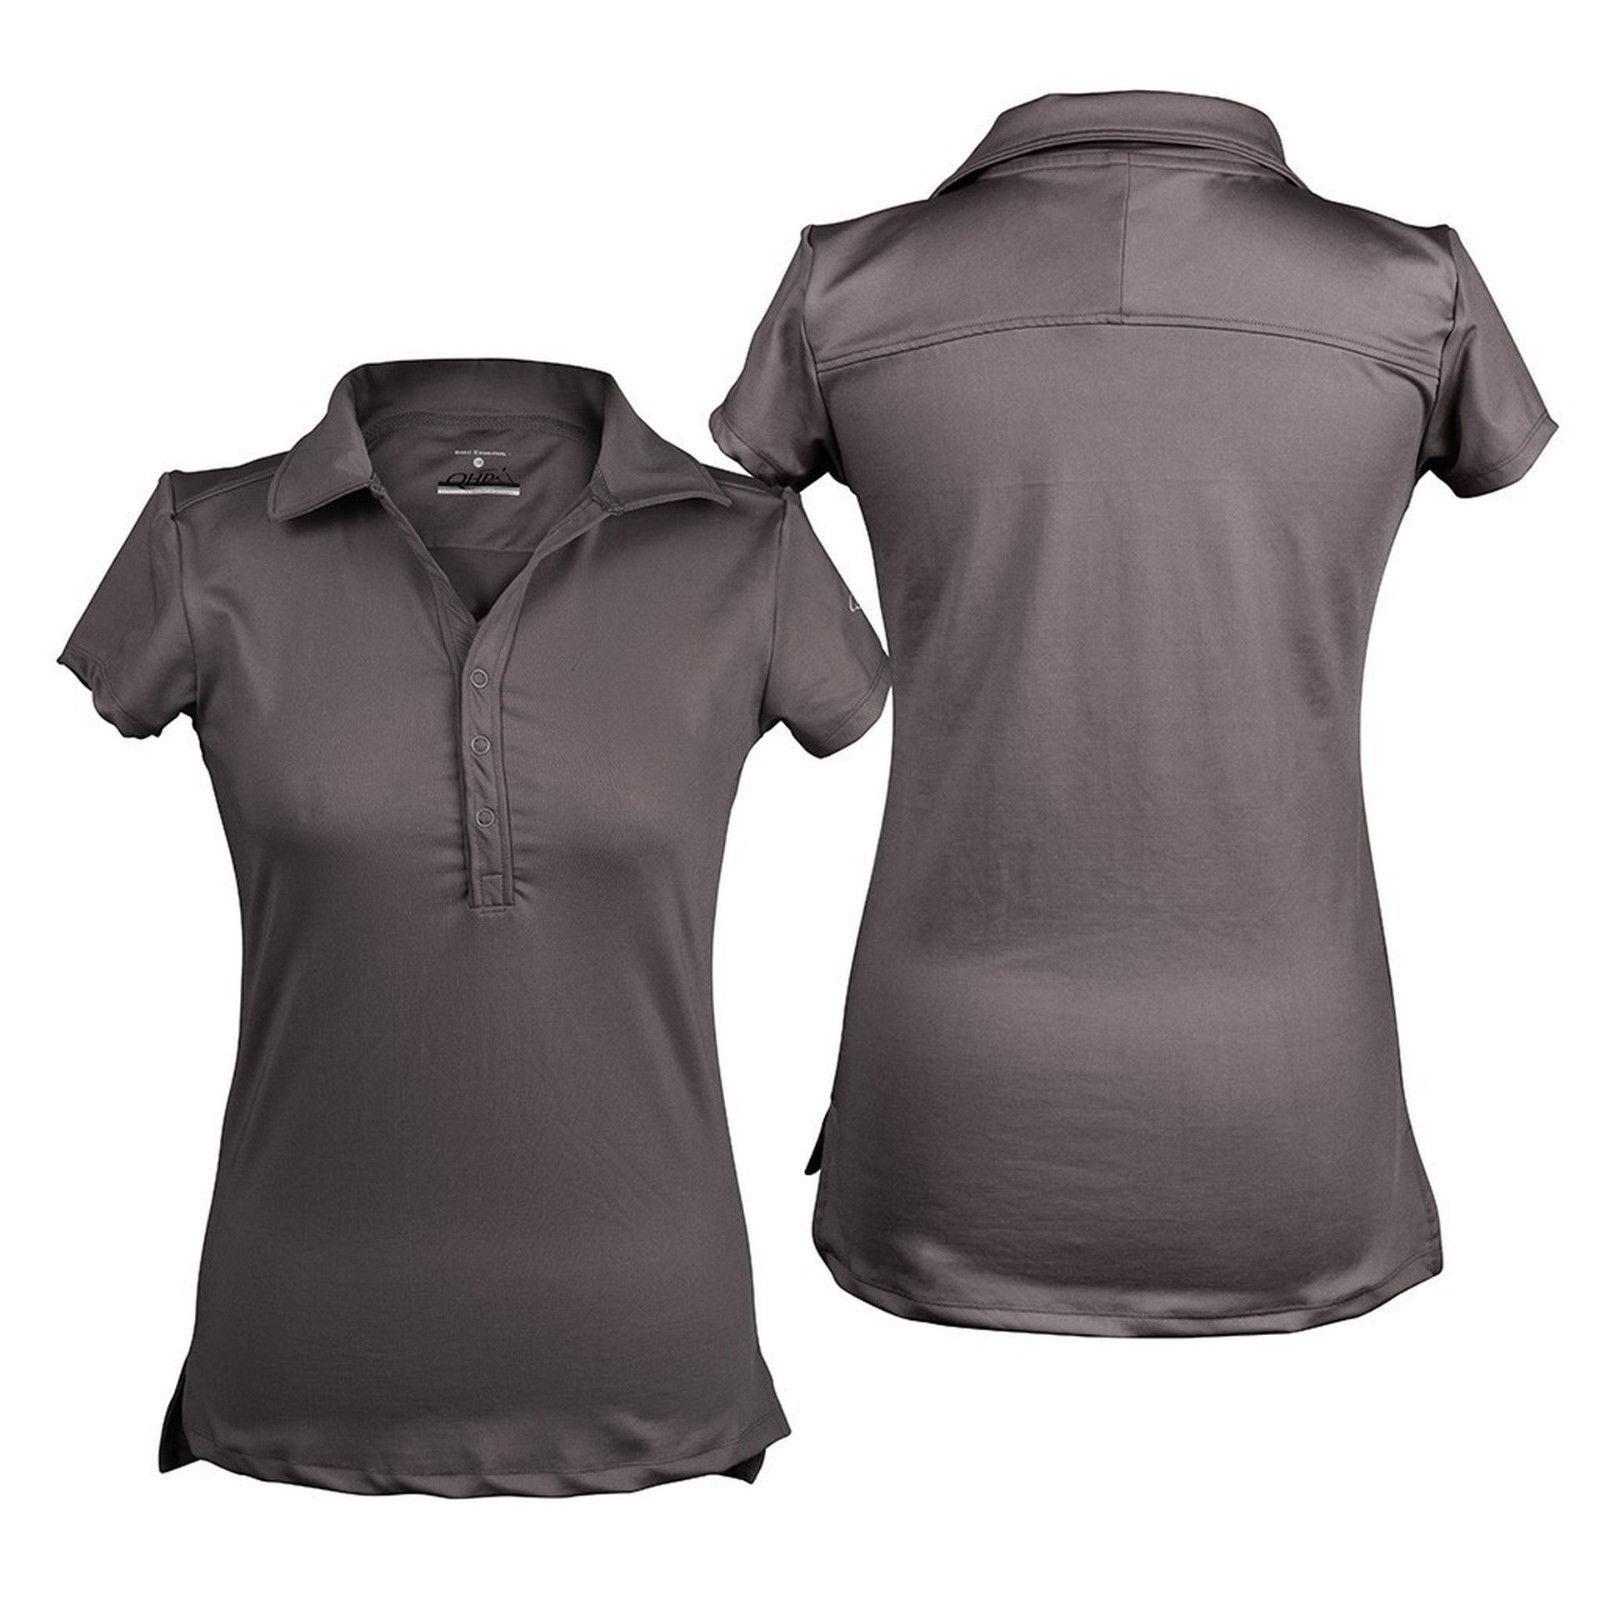 2811df0dec1186 QHP Damen Polo-Shirt Luna kurzarm Kragen Basismodell Anthrazit ...